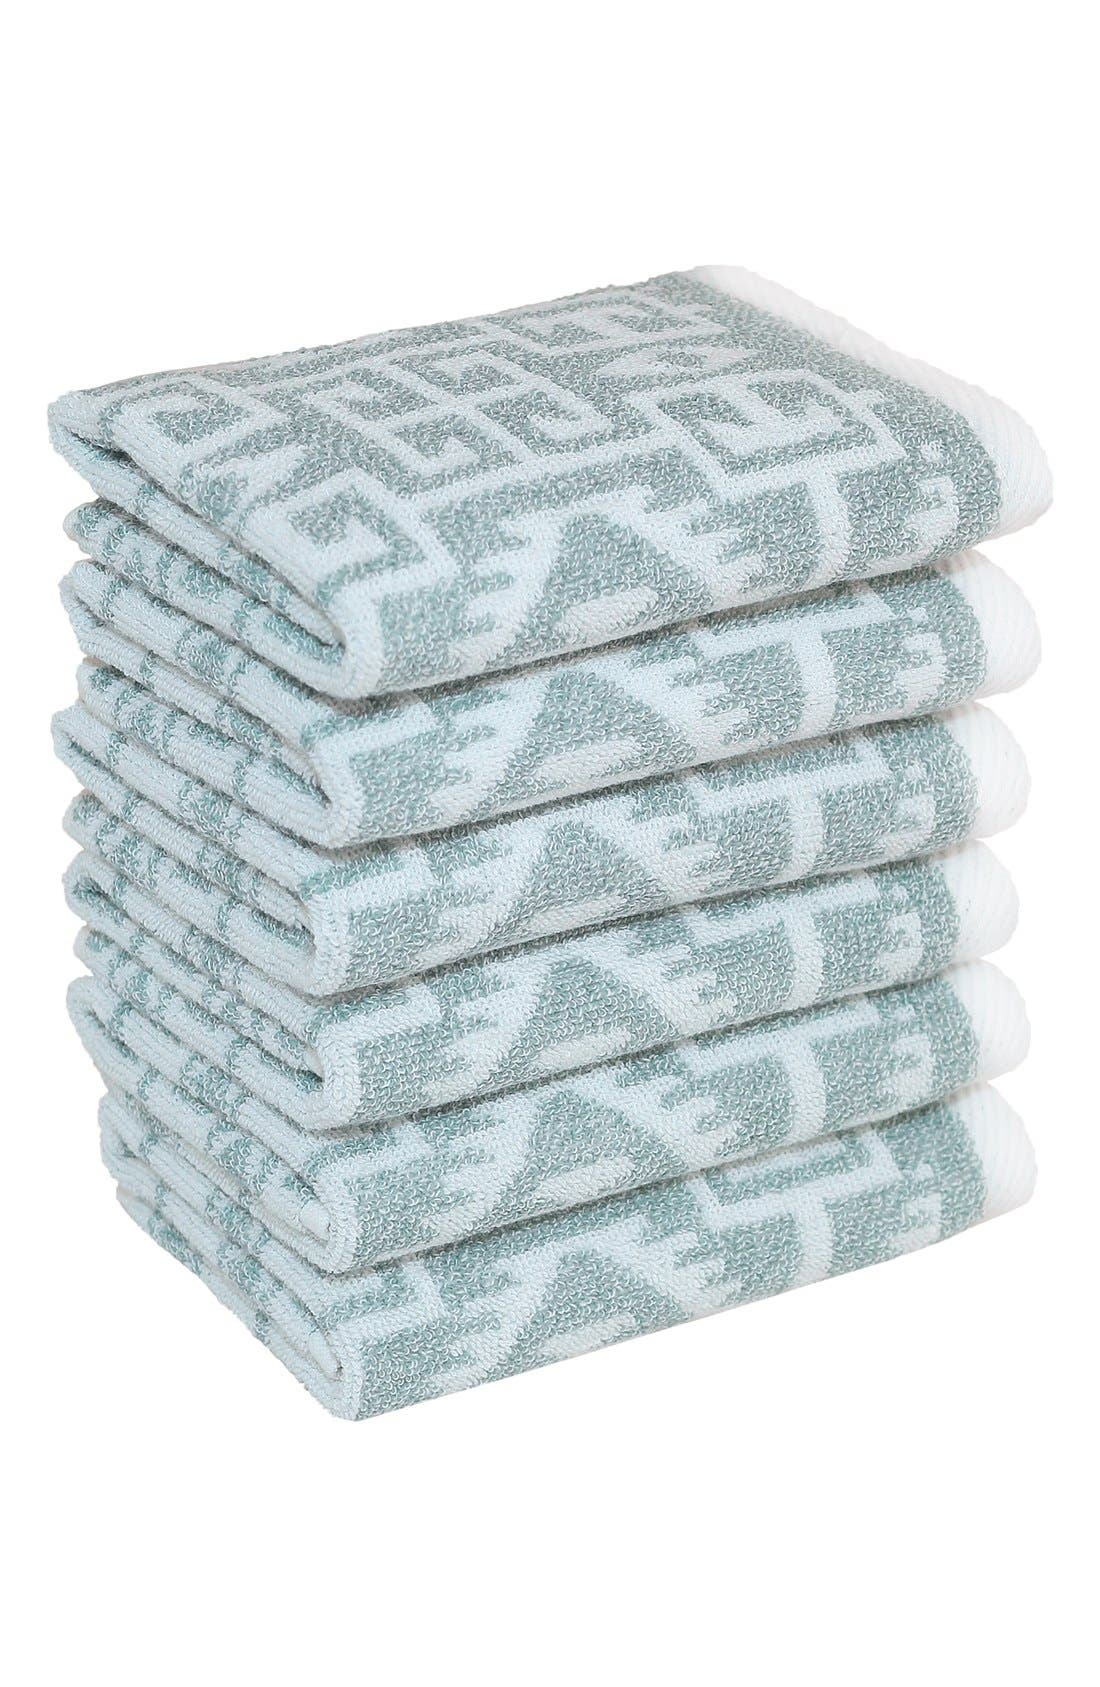 Linum 'Kula' Turkish Cotton Washcloths (Set of 6)